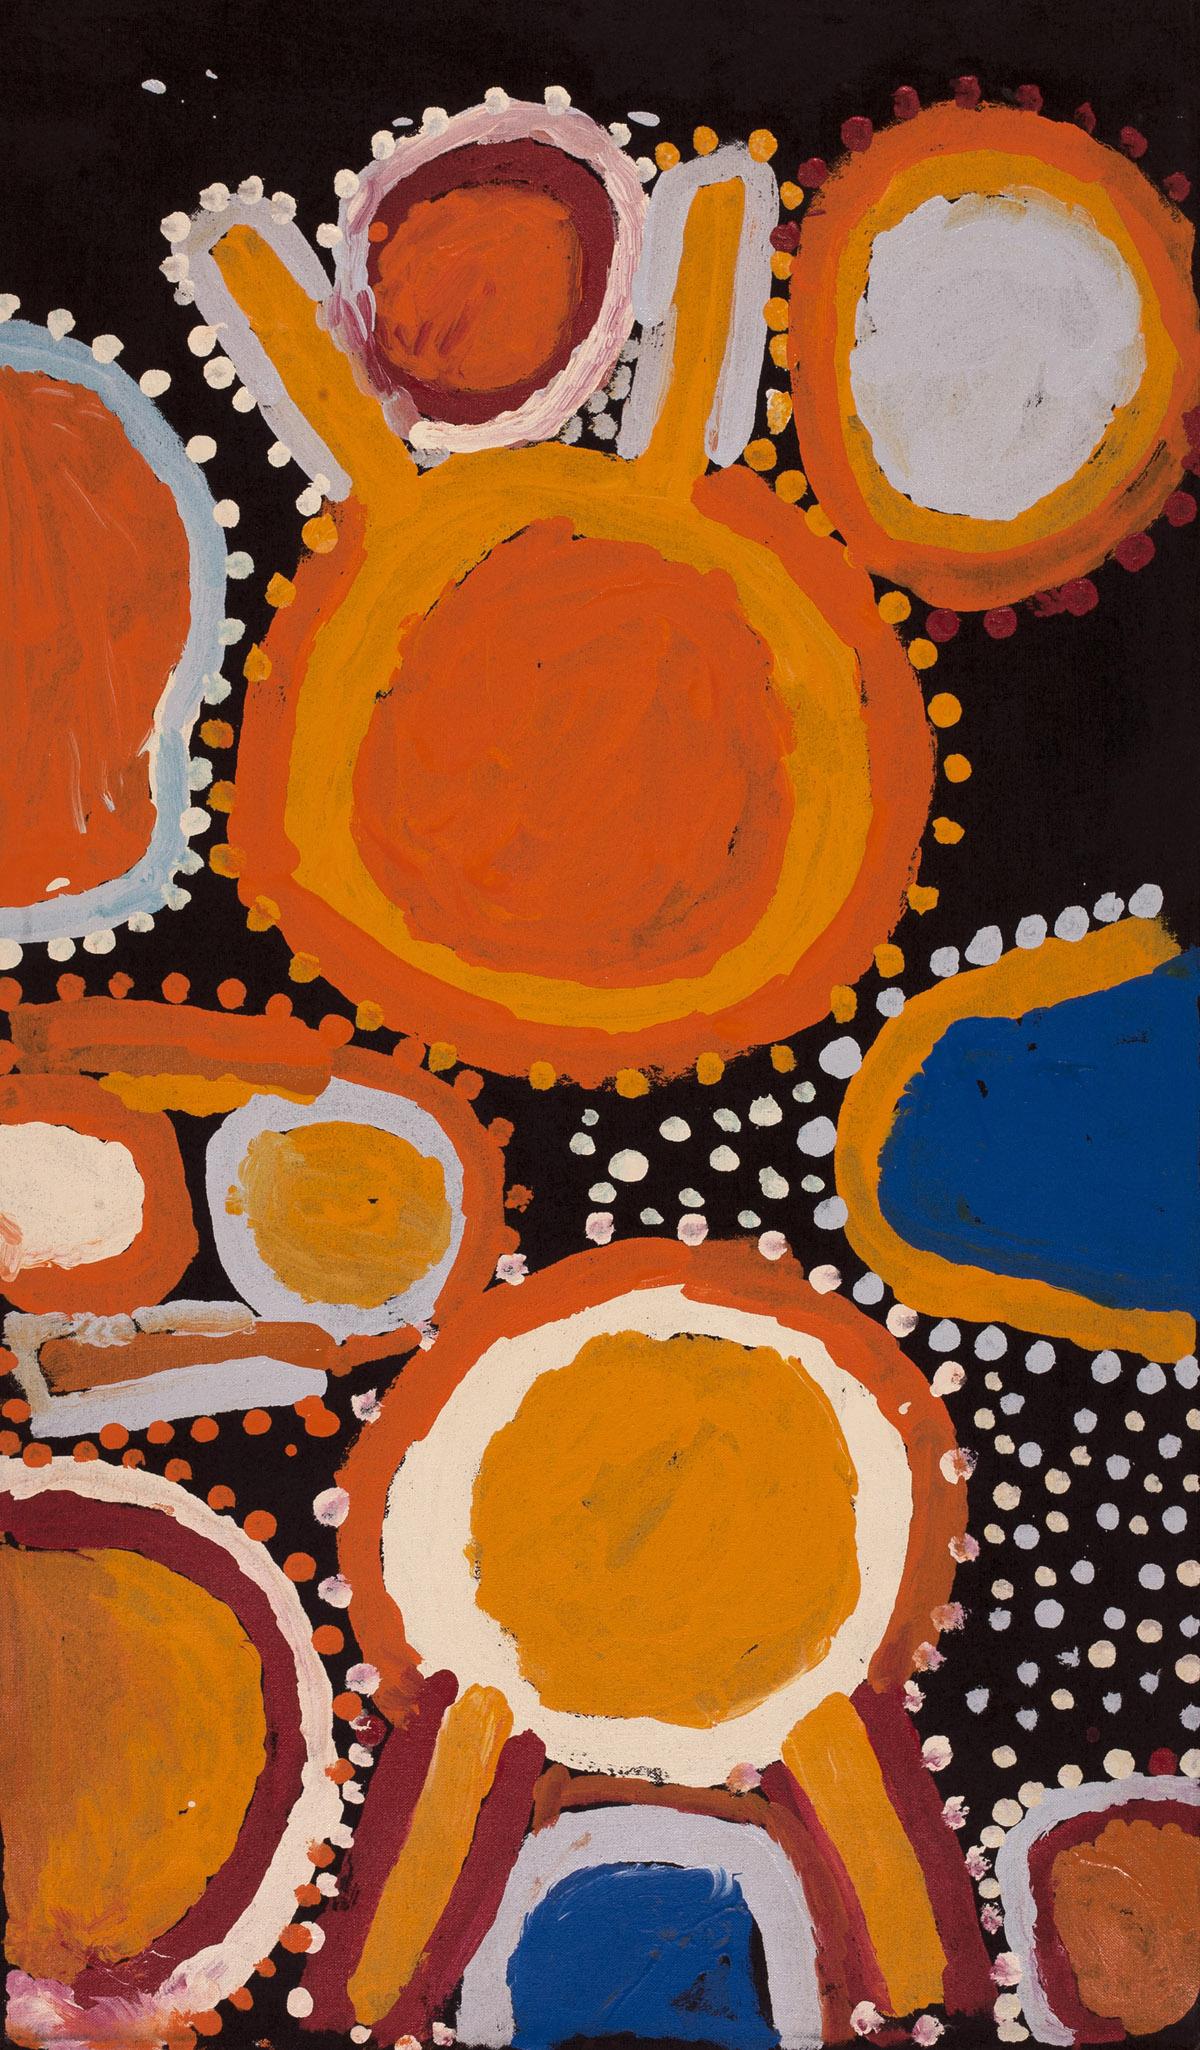 "Sandy Brumby  Wapilka  Acrylic on Belgian linen 42"" x 24"" (107 x 61 cm) Ninuku Arts Catalog #11543   Price Available upon Request"